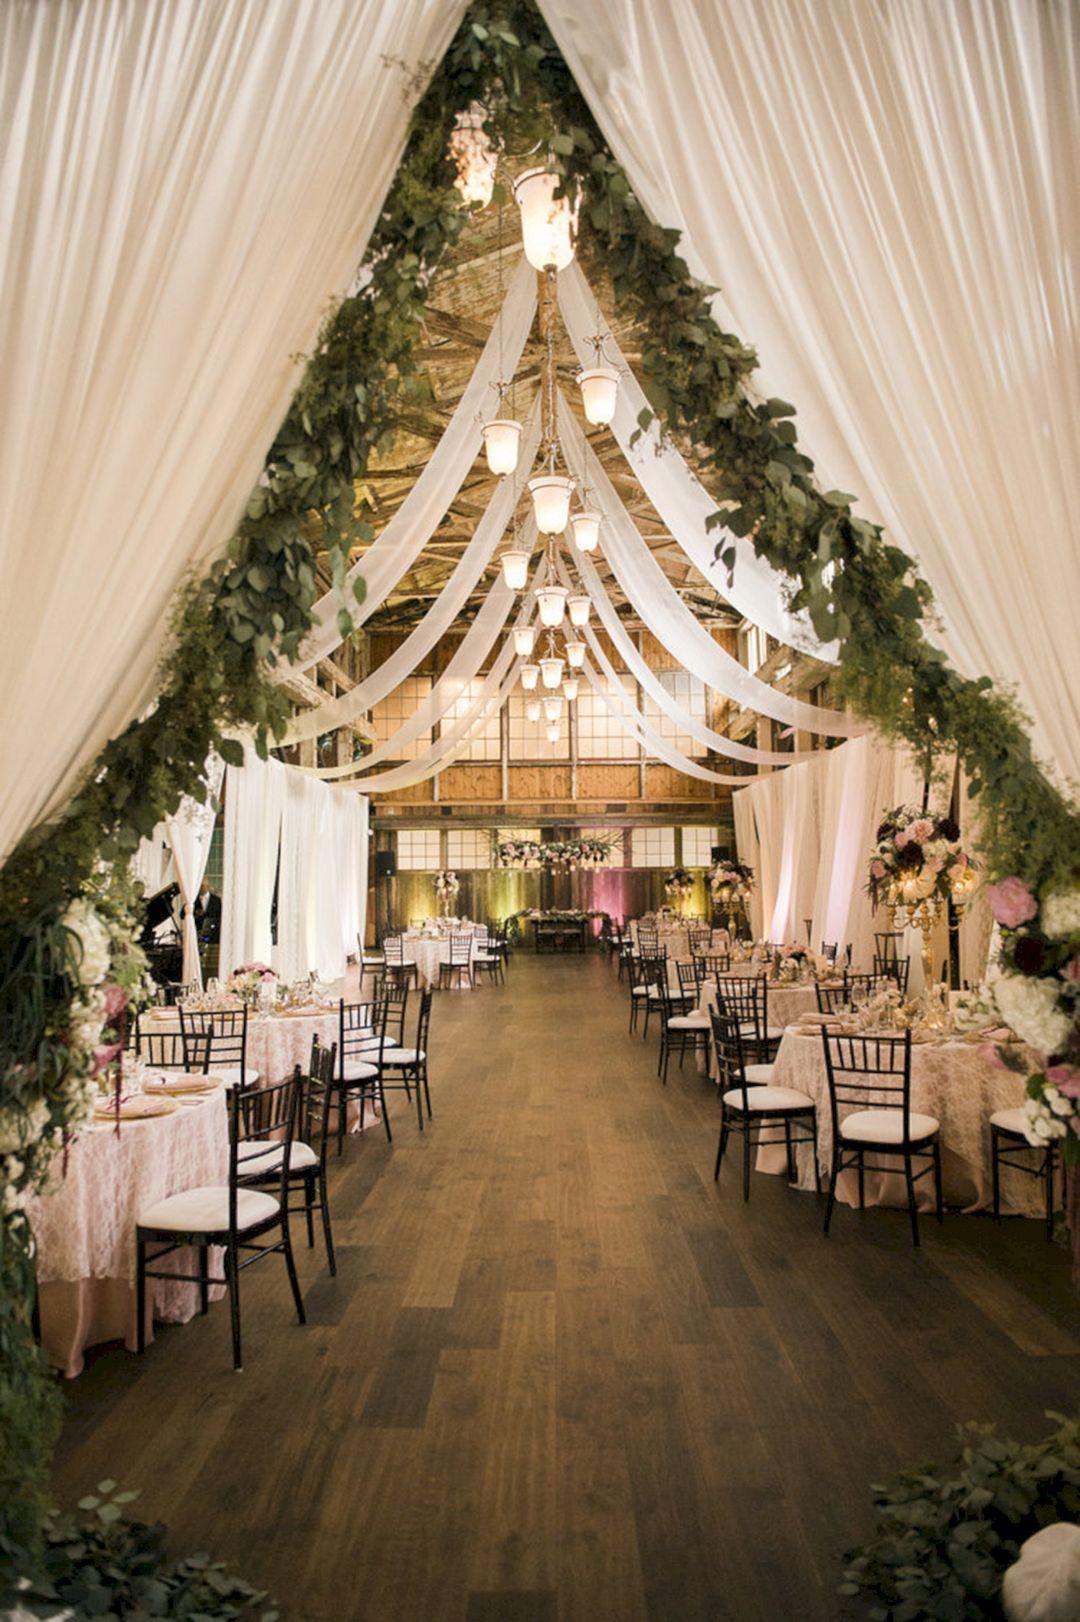 Wedding decoration ideas rustic   Most Romantic Rustic Wedding Decor Ideas That You Never Seen